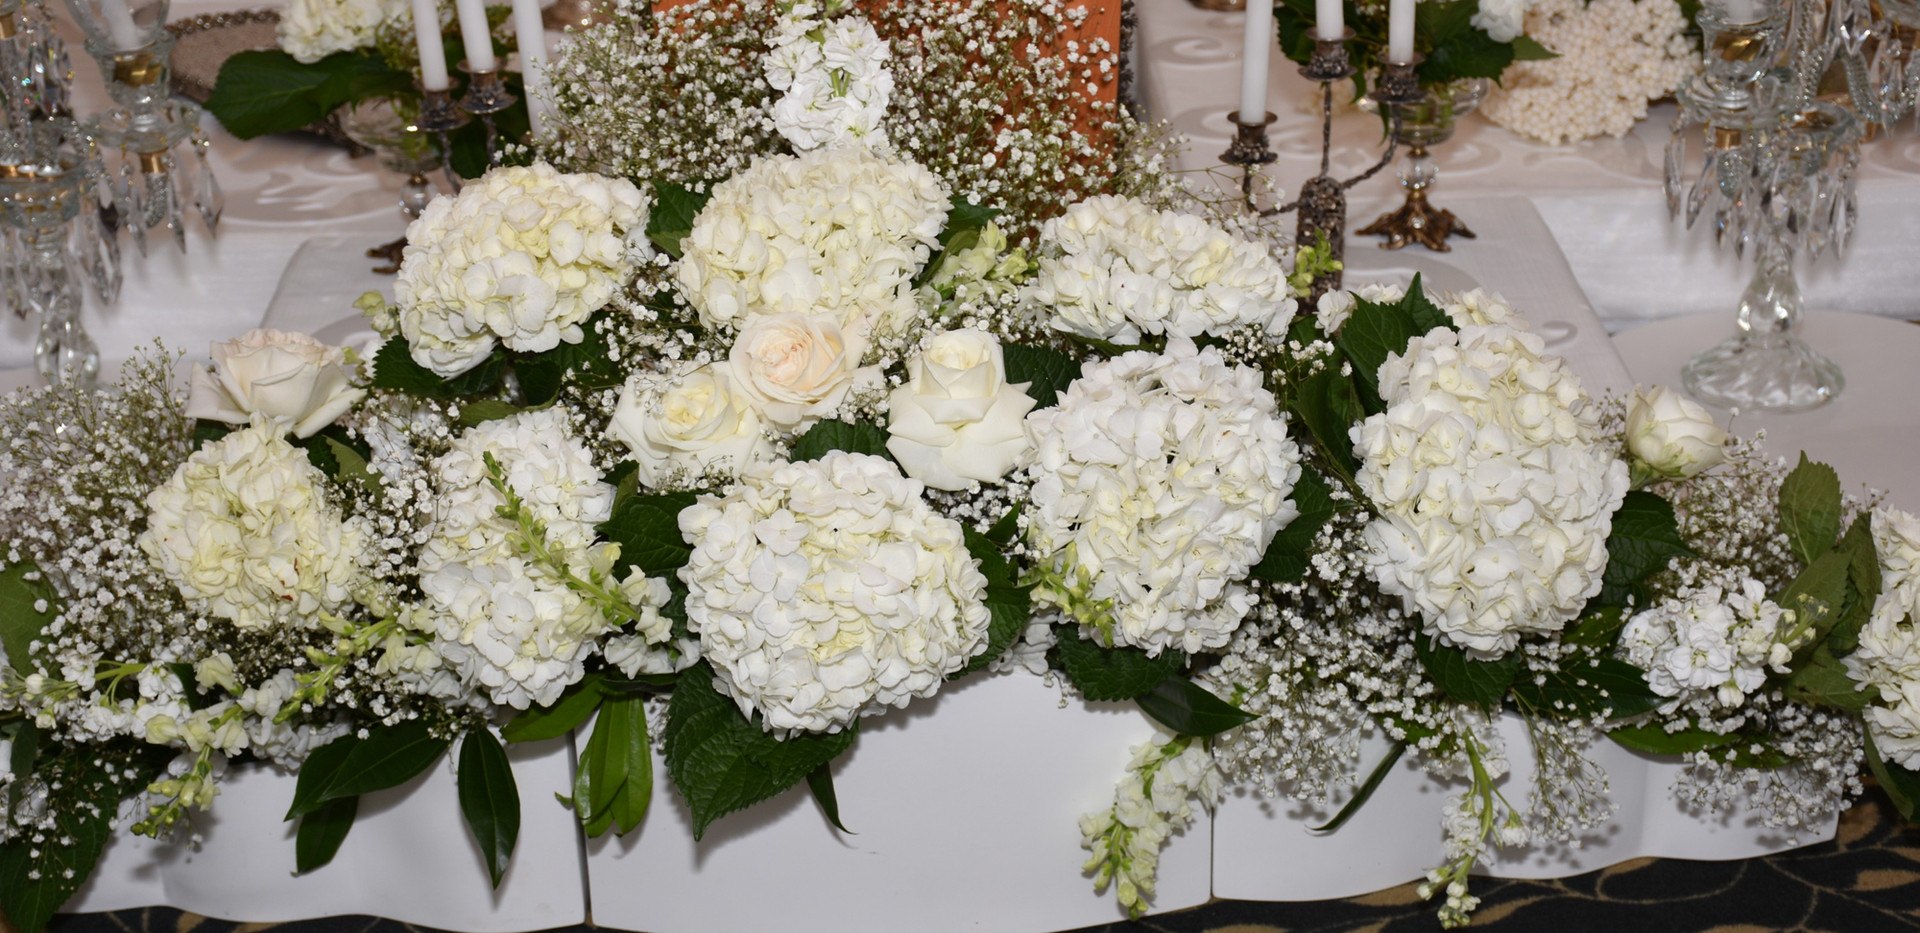 Sofreh Aghd Flower displays.jpg